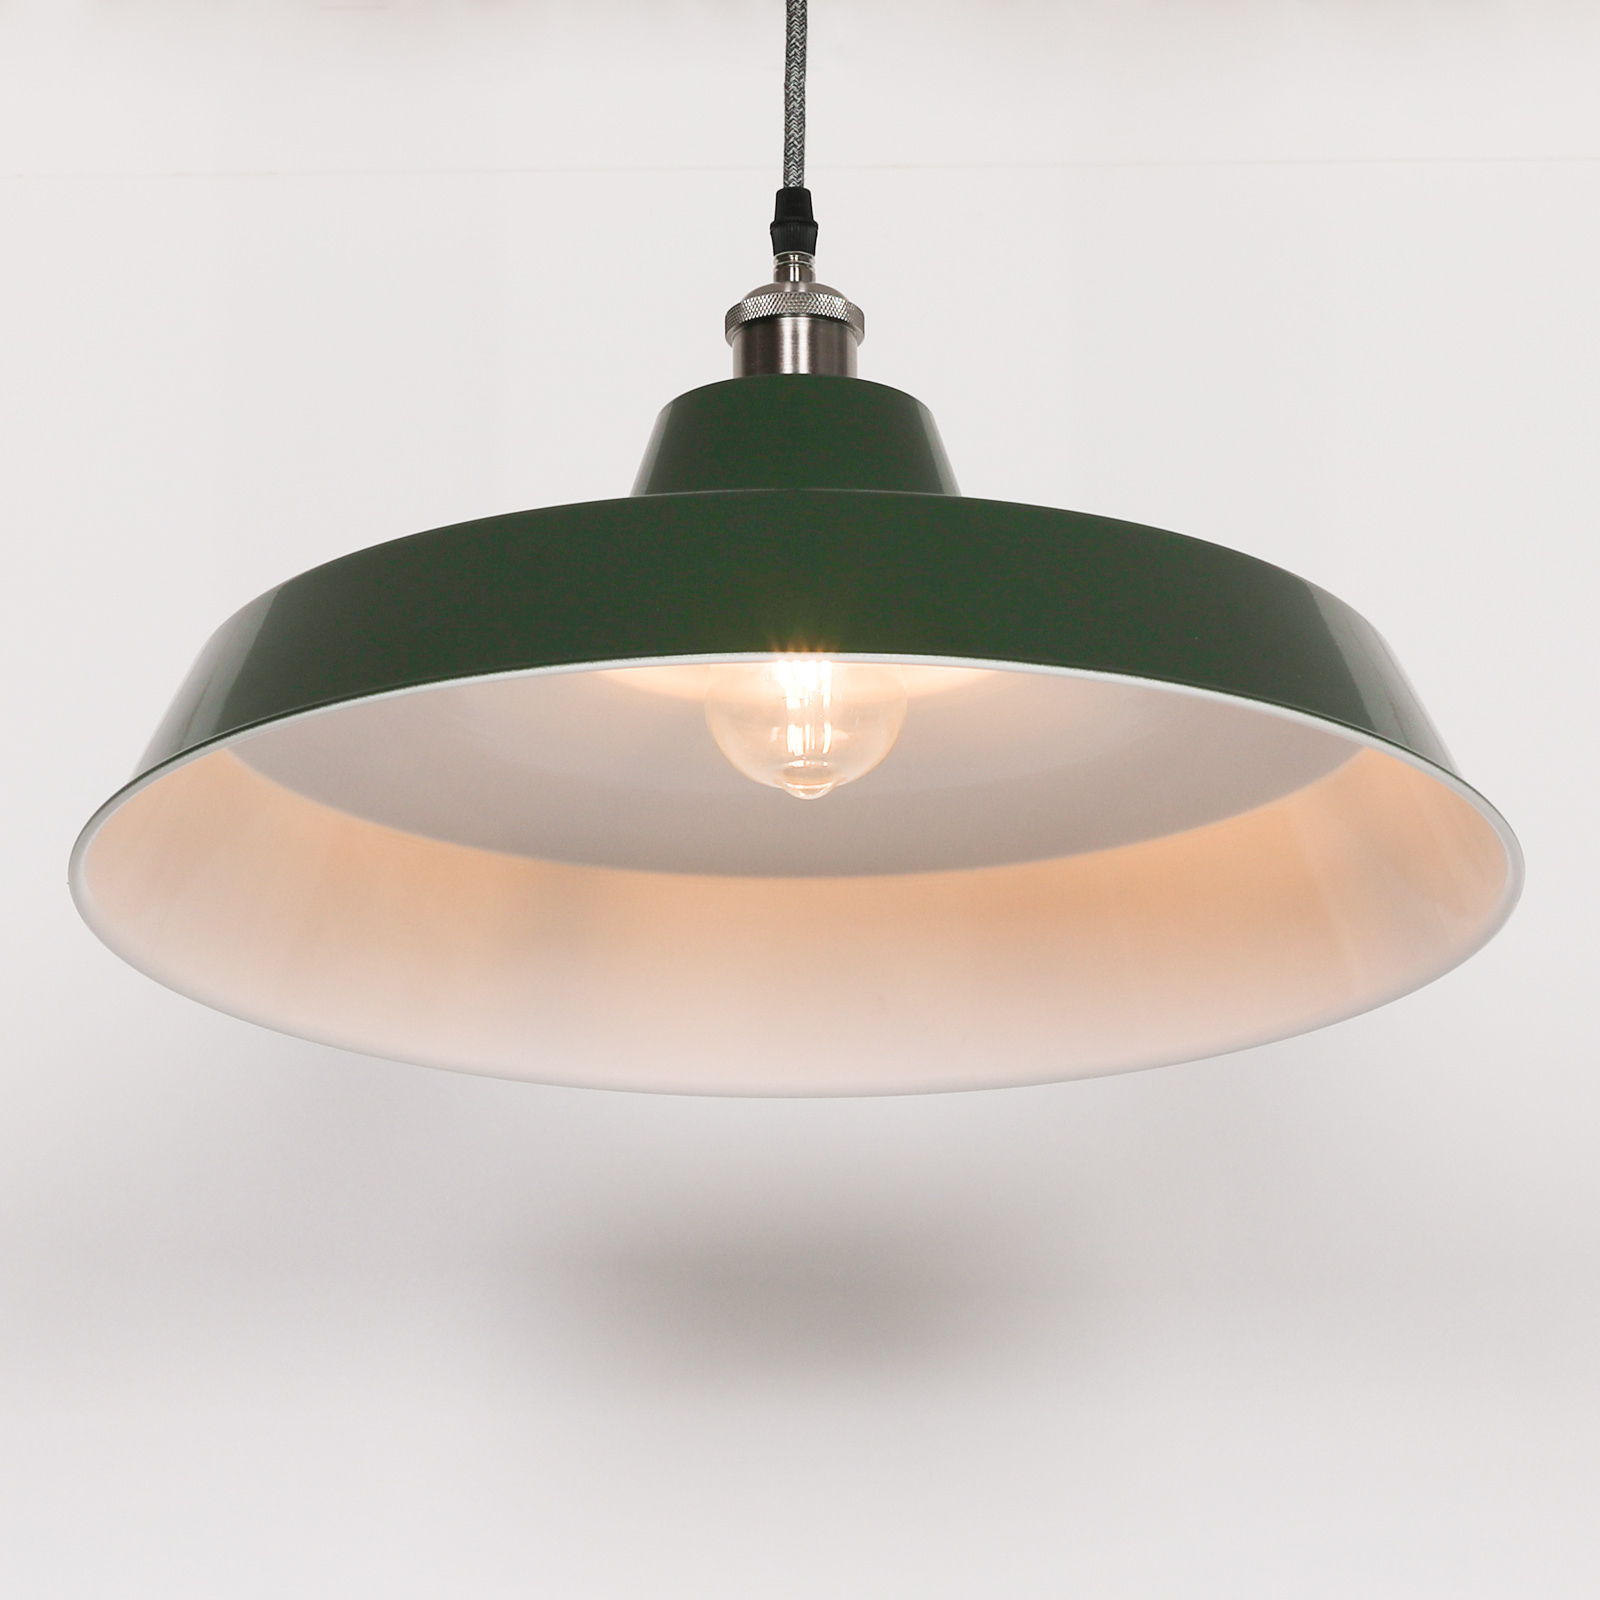 Factory Style British Green Enamel Painted 46cm Pendant Light